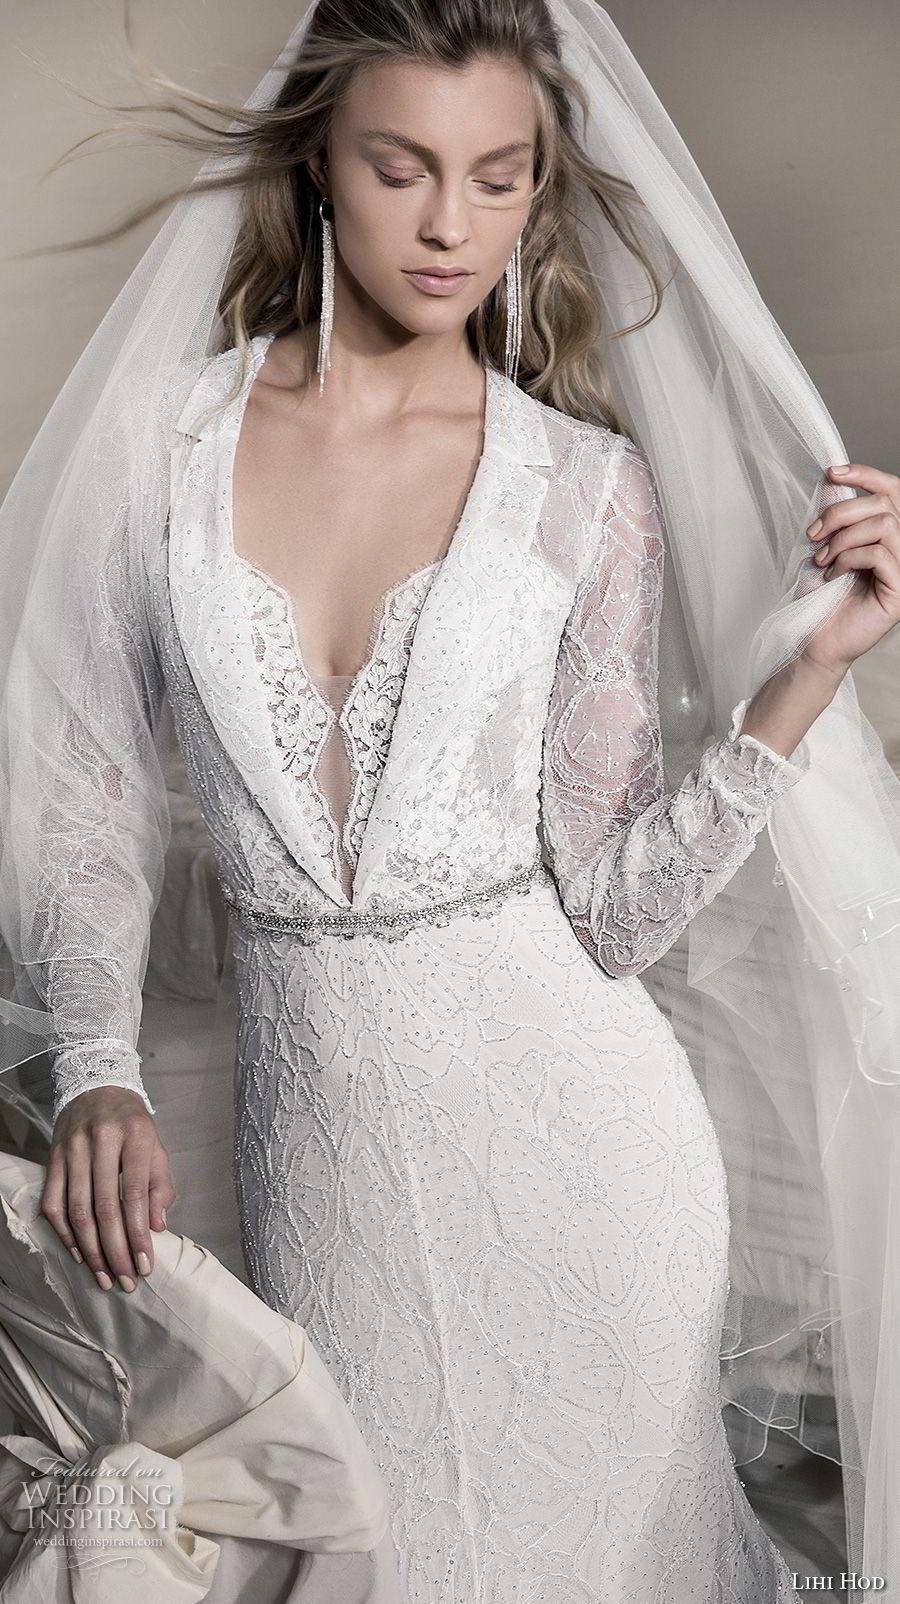 lihi hod 2018 bridal long sleeves notched collar deep v neck full embellishment elegant fit and flare sheath wedding dress covered lace back sweep train (12) zv